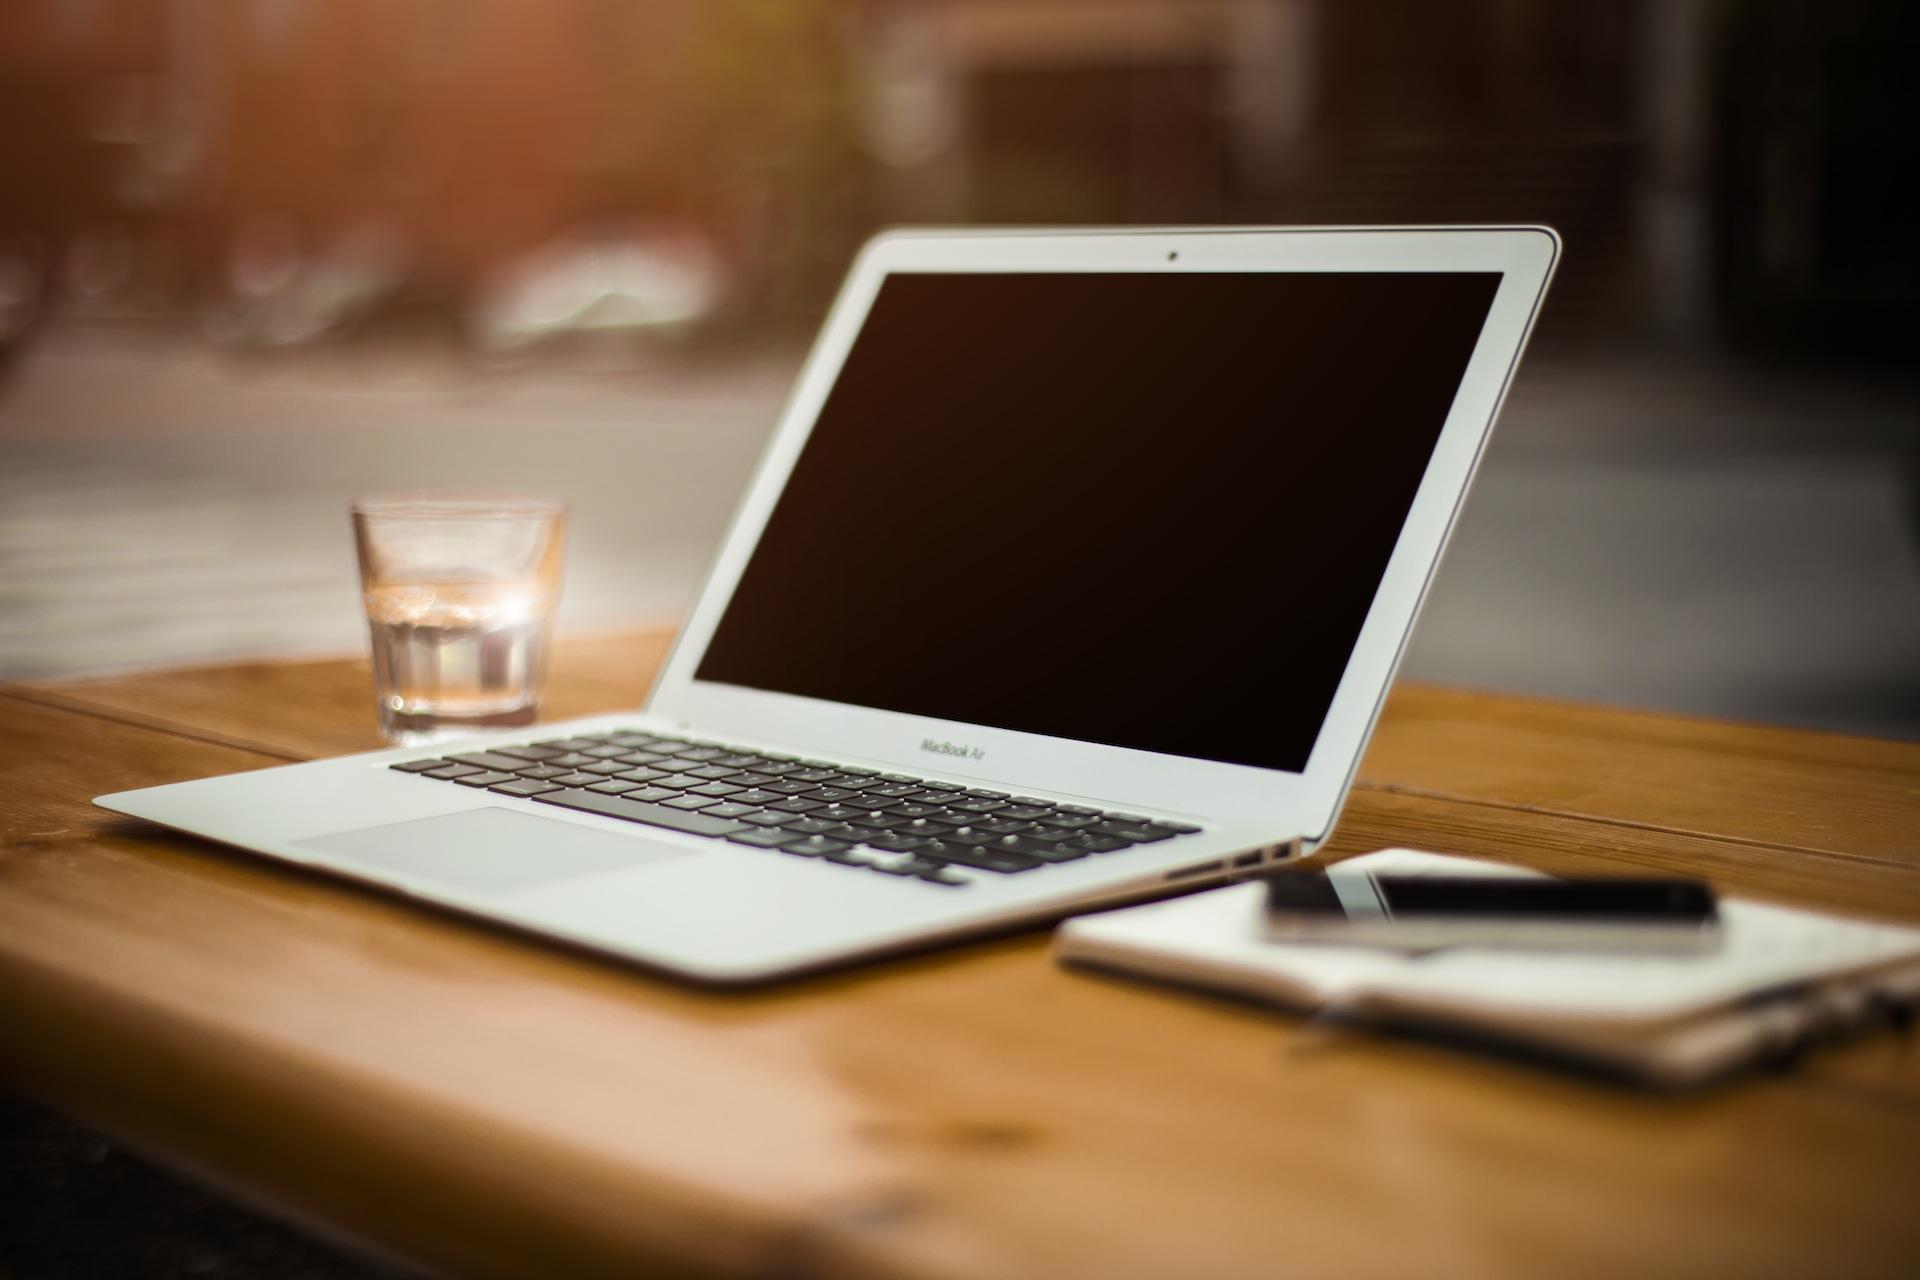 website-maintenance-updates-eureka-california-humboldt-county-web-designer-services-marketing